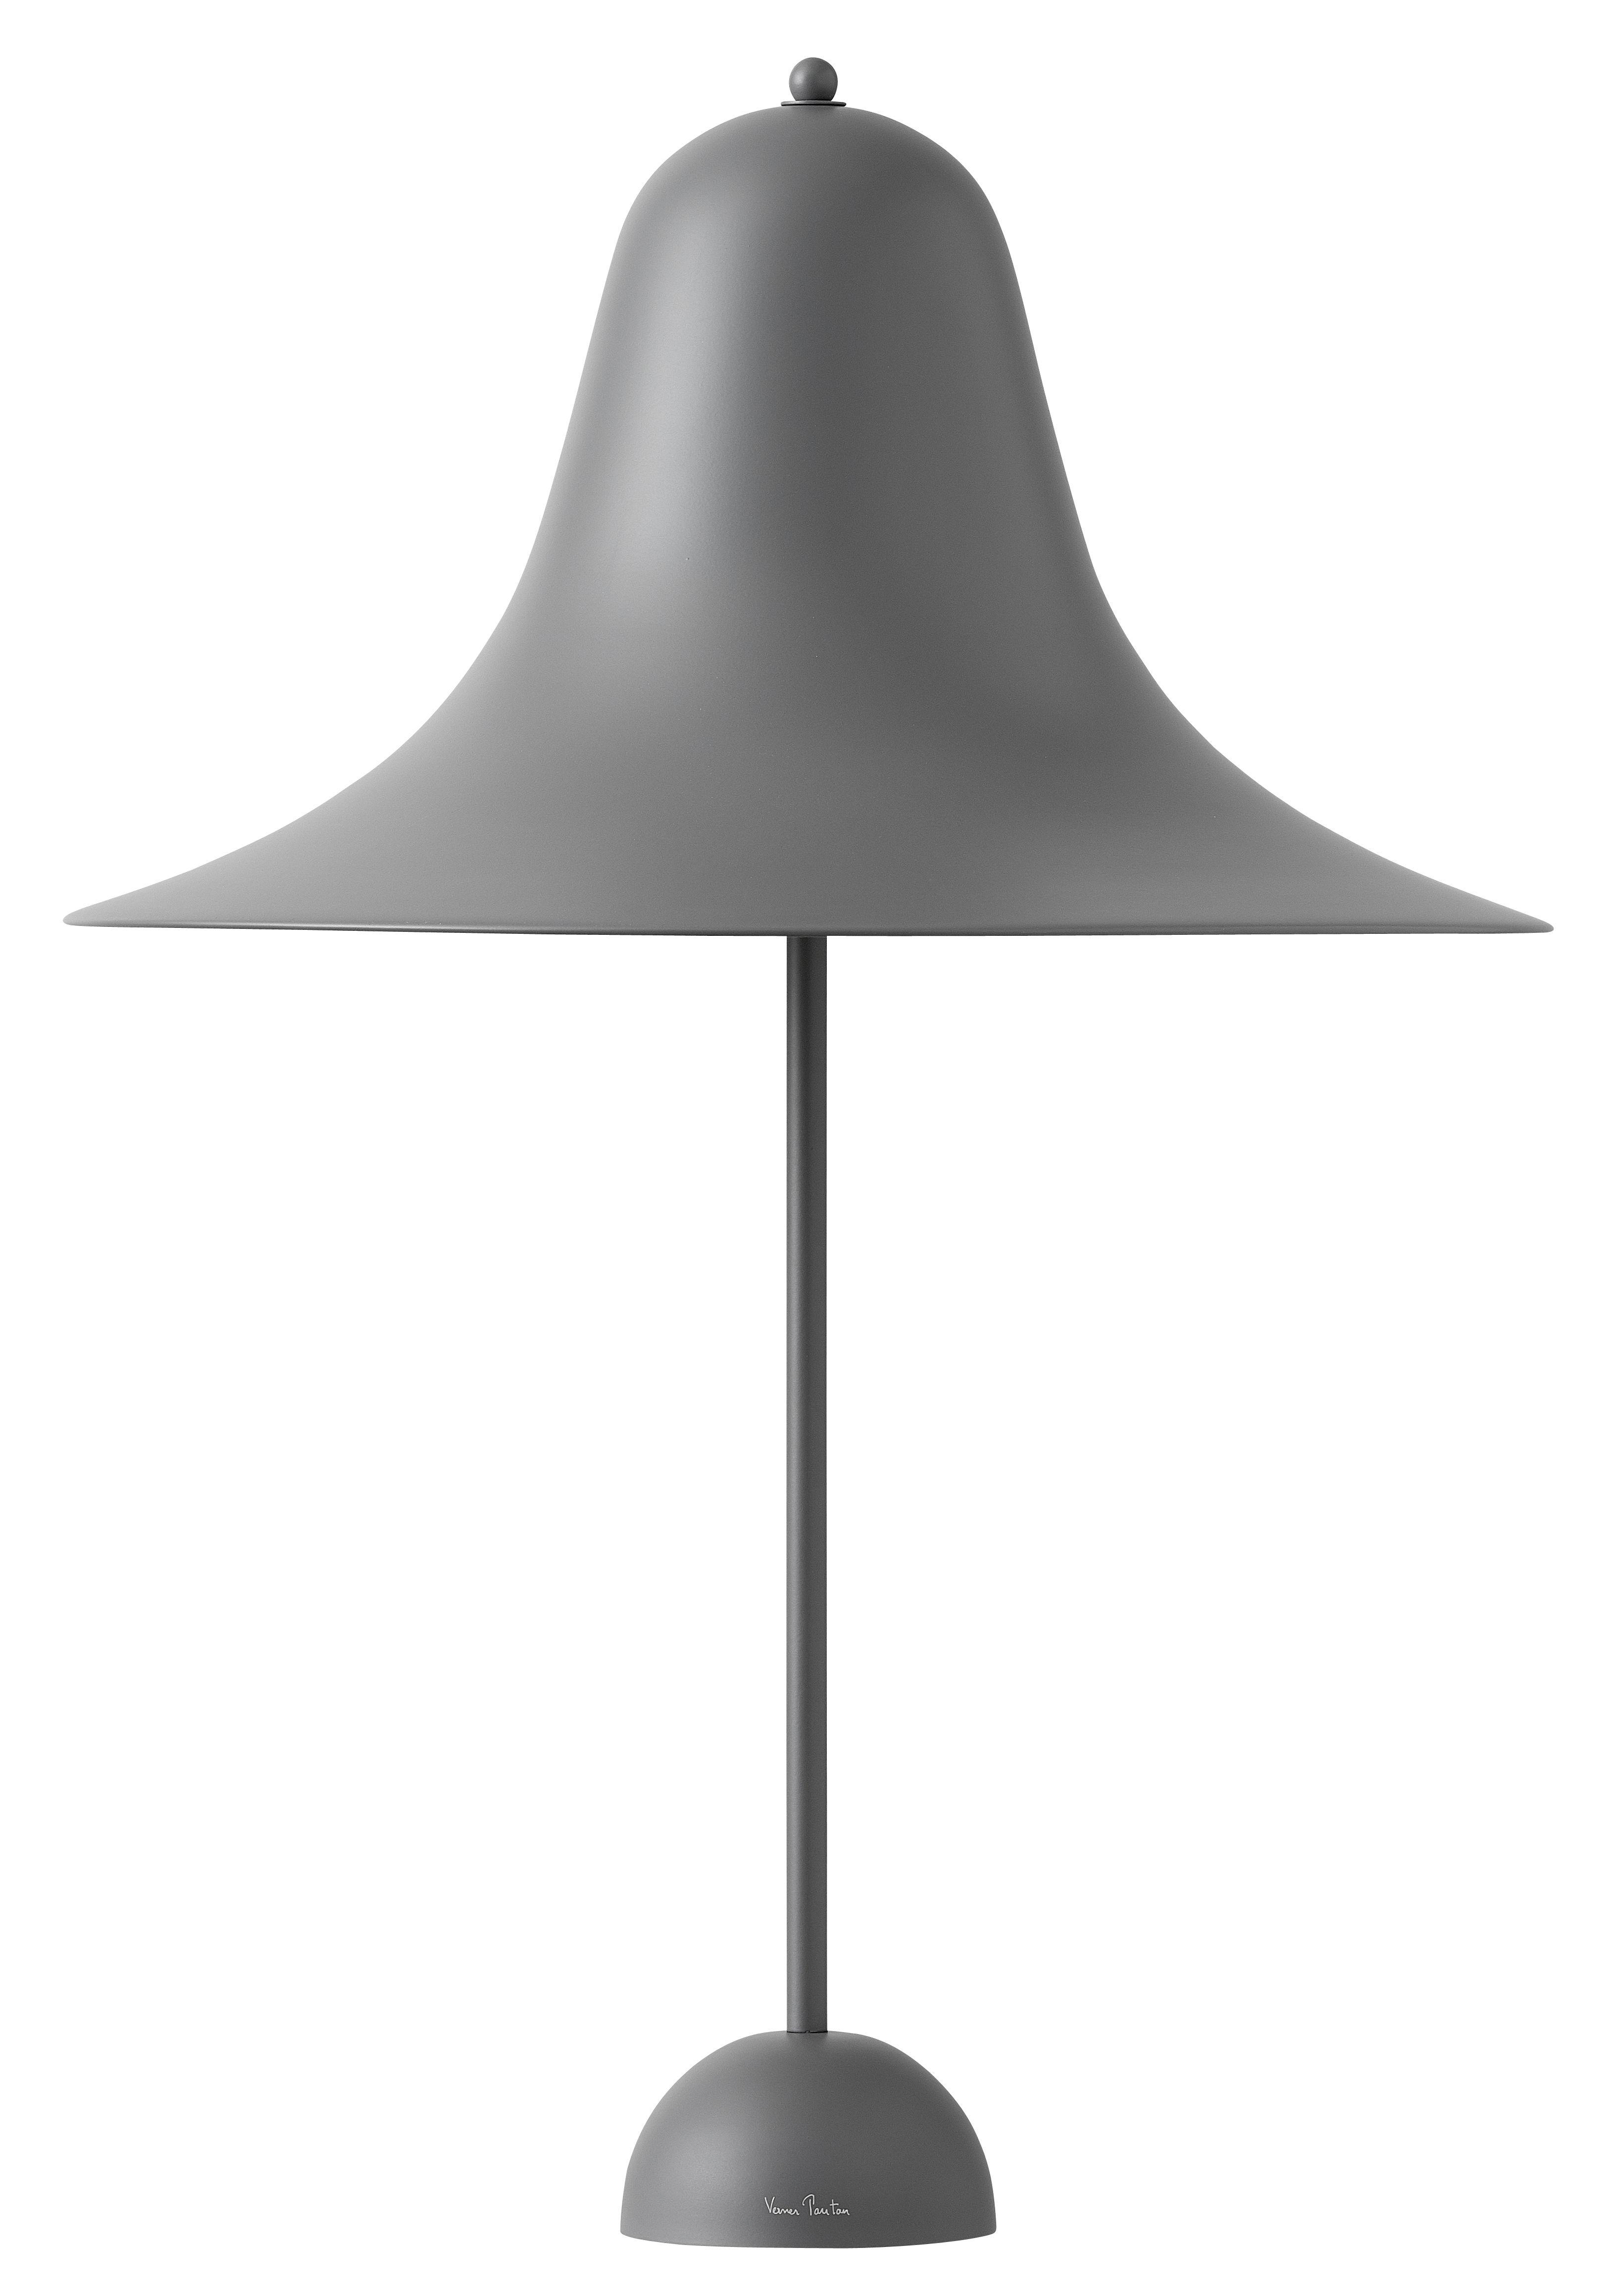 Lighting - Table Lamps - Pantop Large Ø 45 cm Table lamp - / Verner Panton (1980) by Verpan - Grey - Lacquered metal